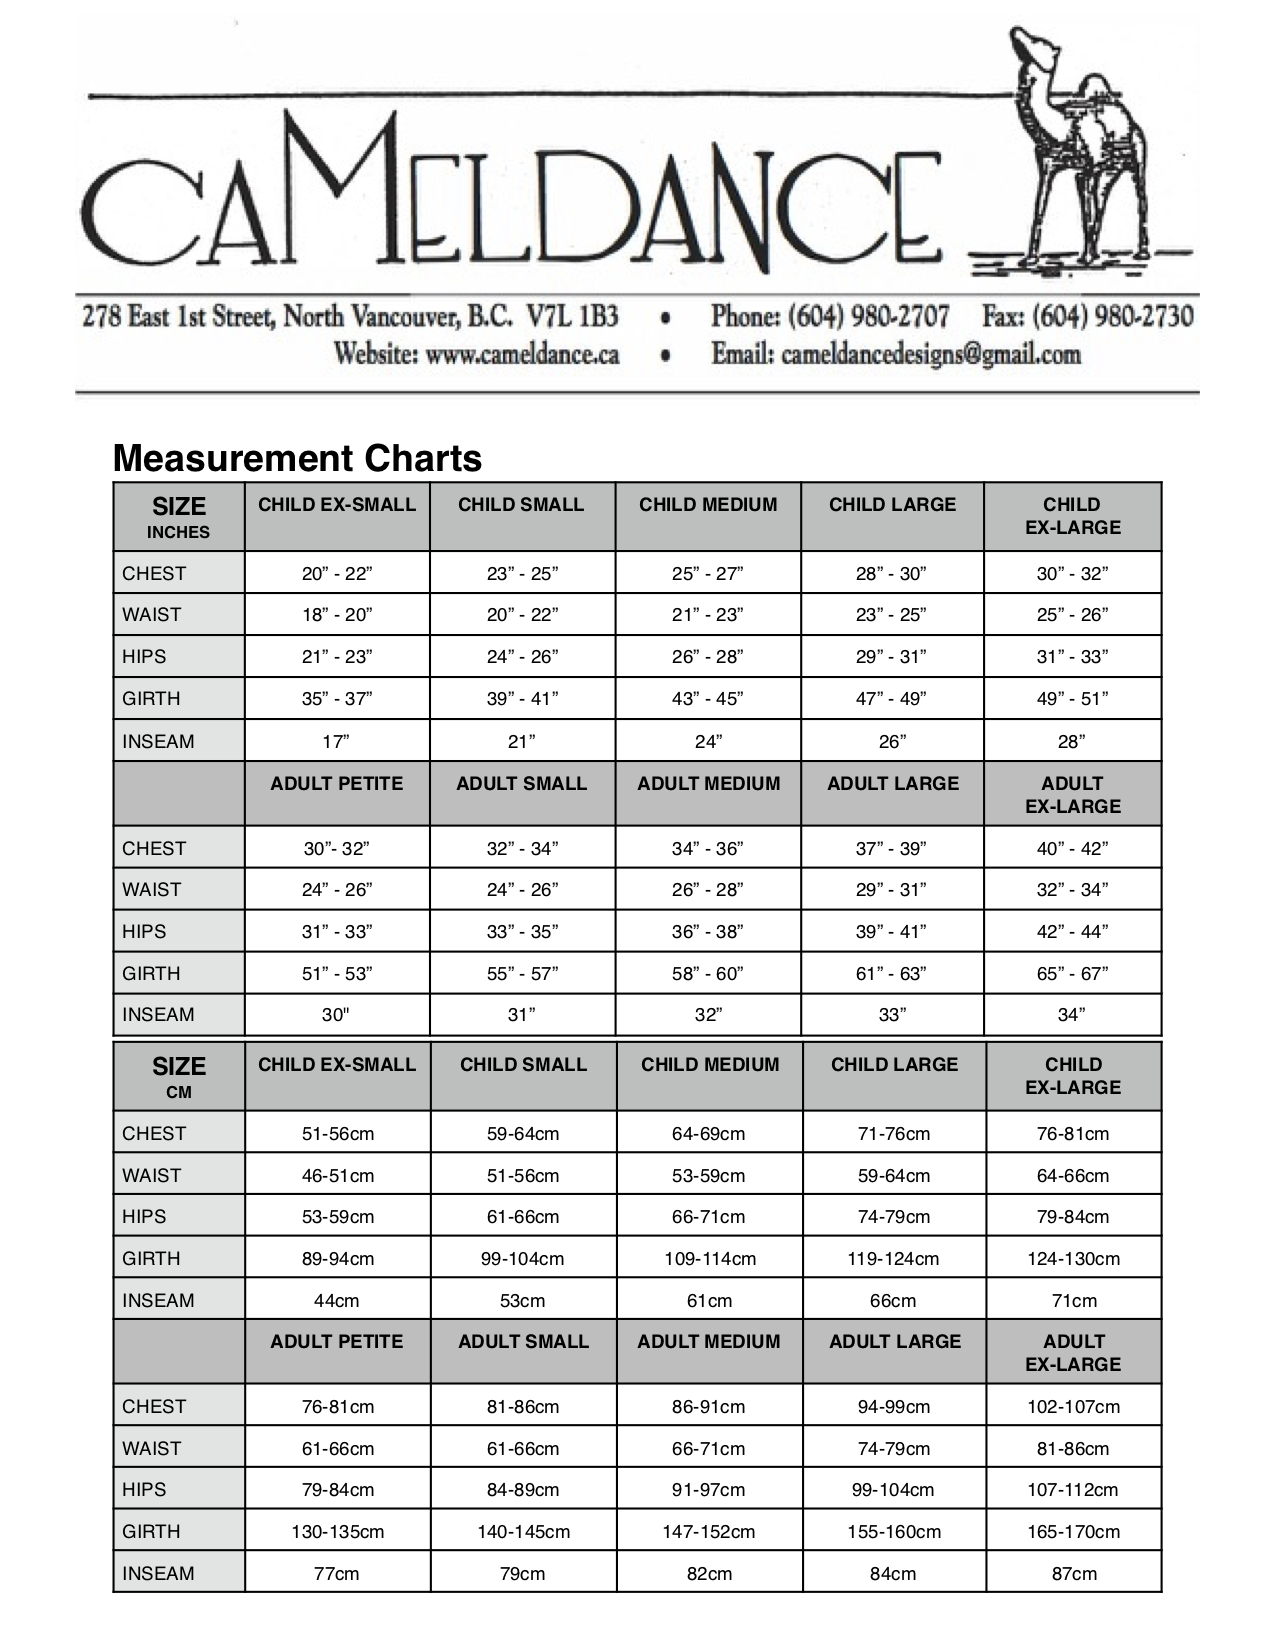 Cameldance Designs 2.png